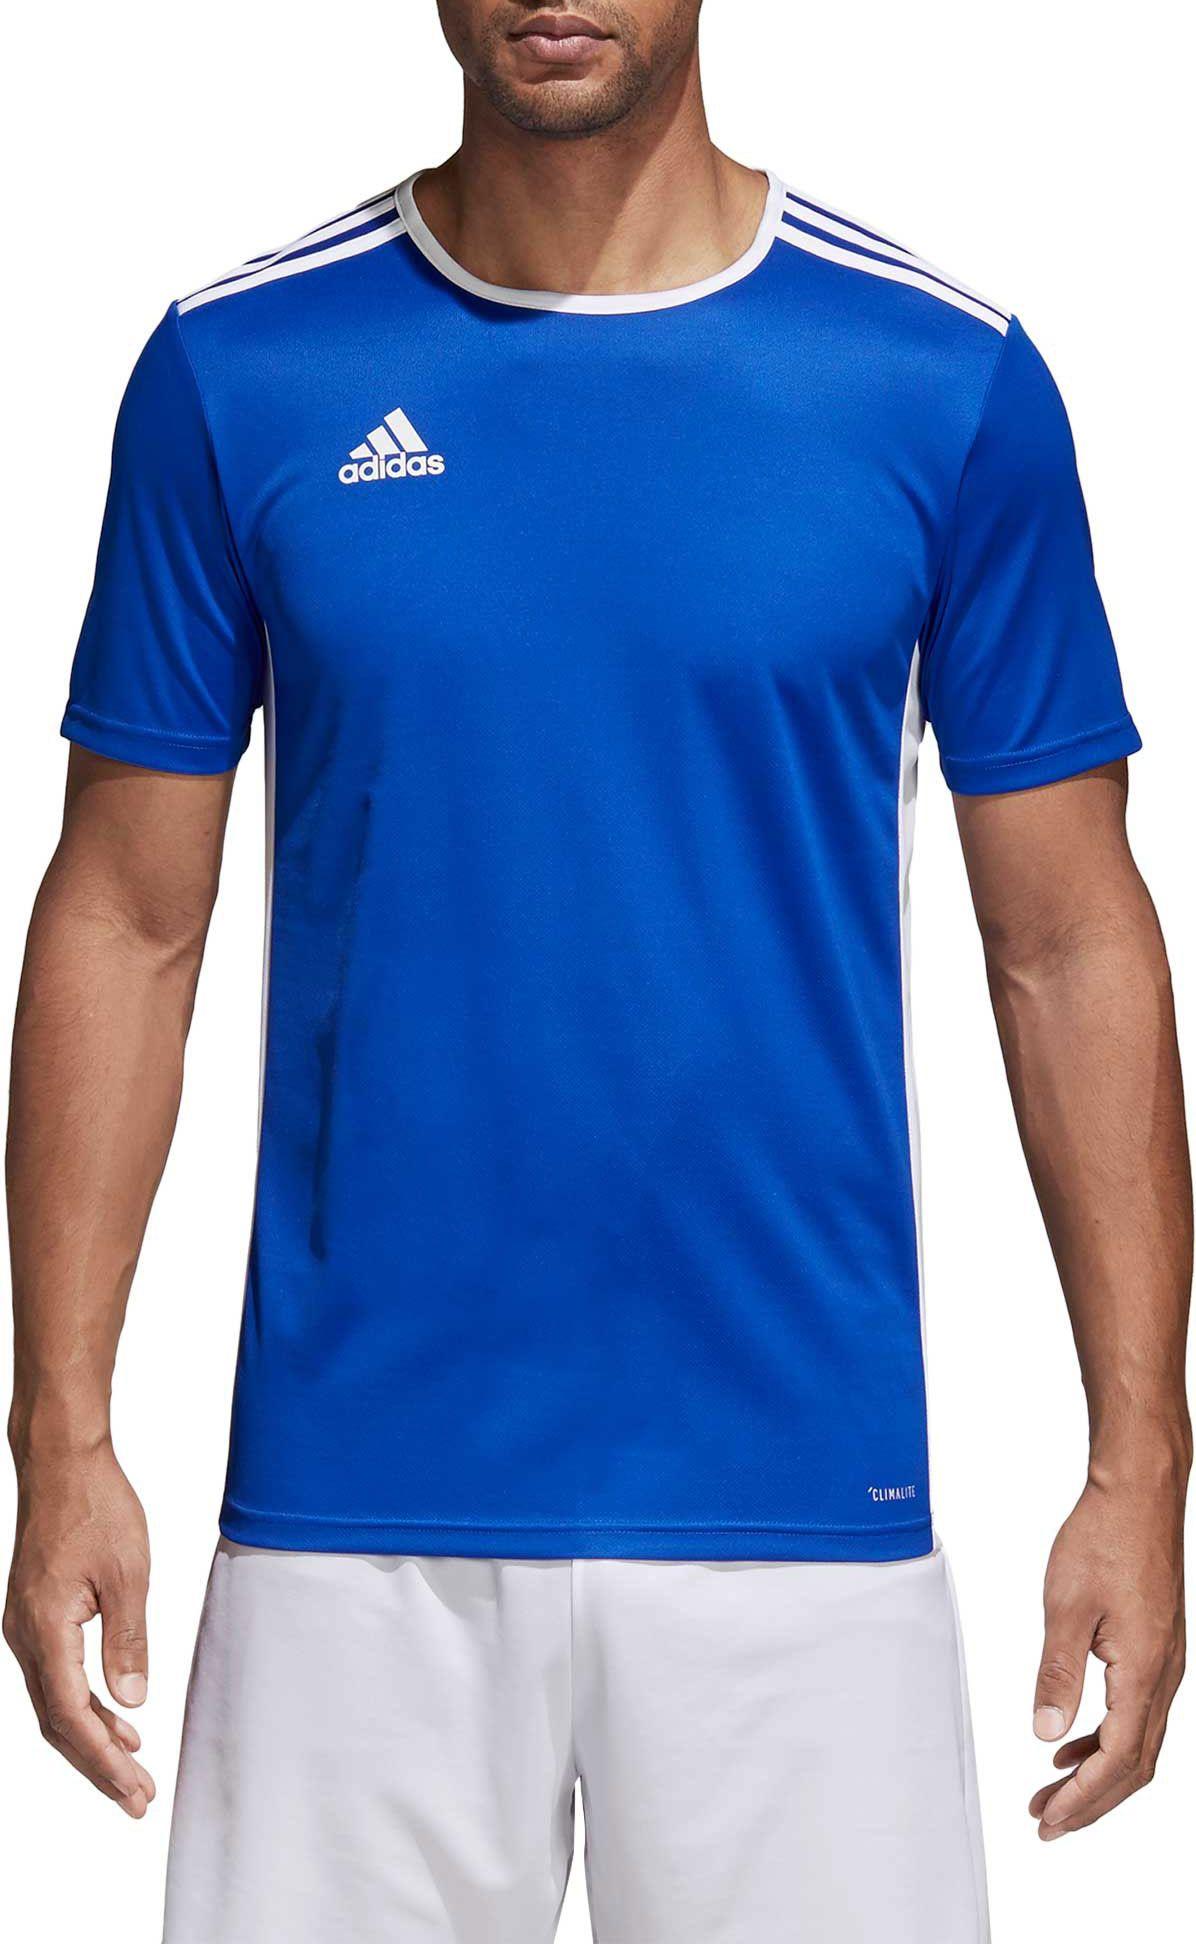 blue adidas shirt